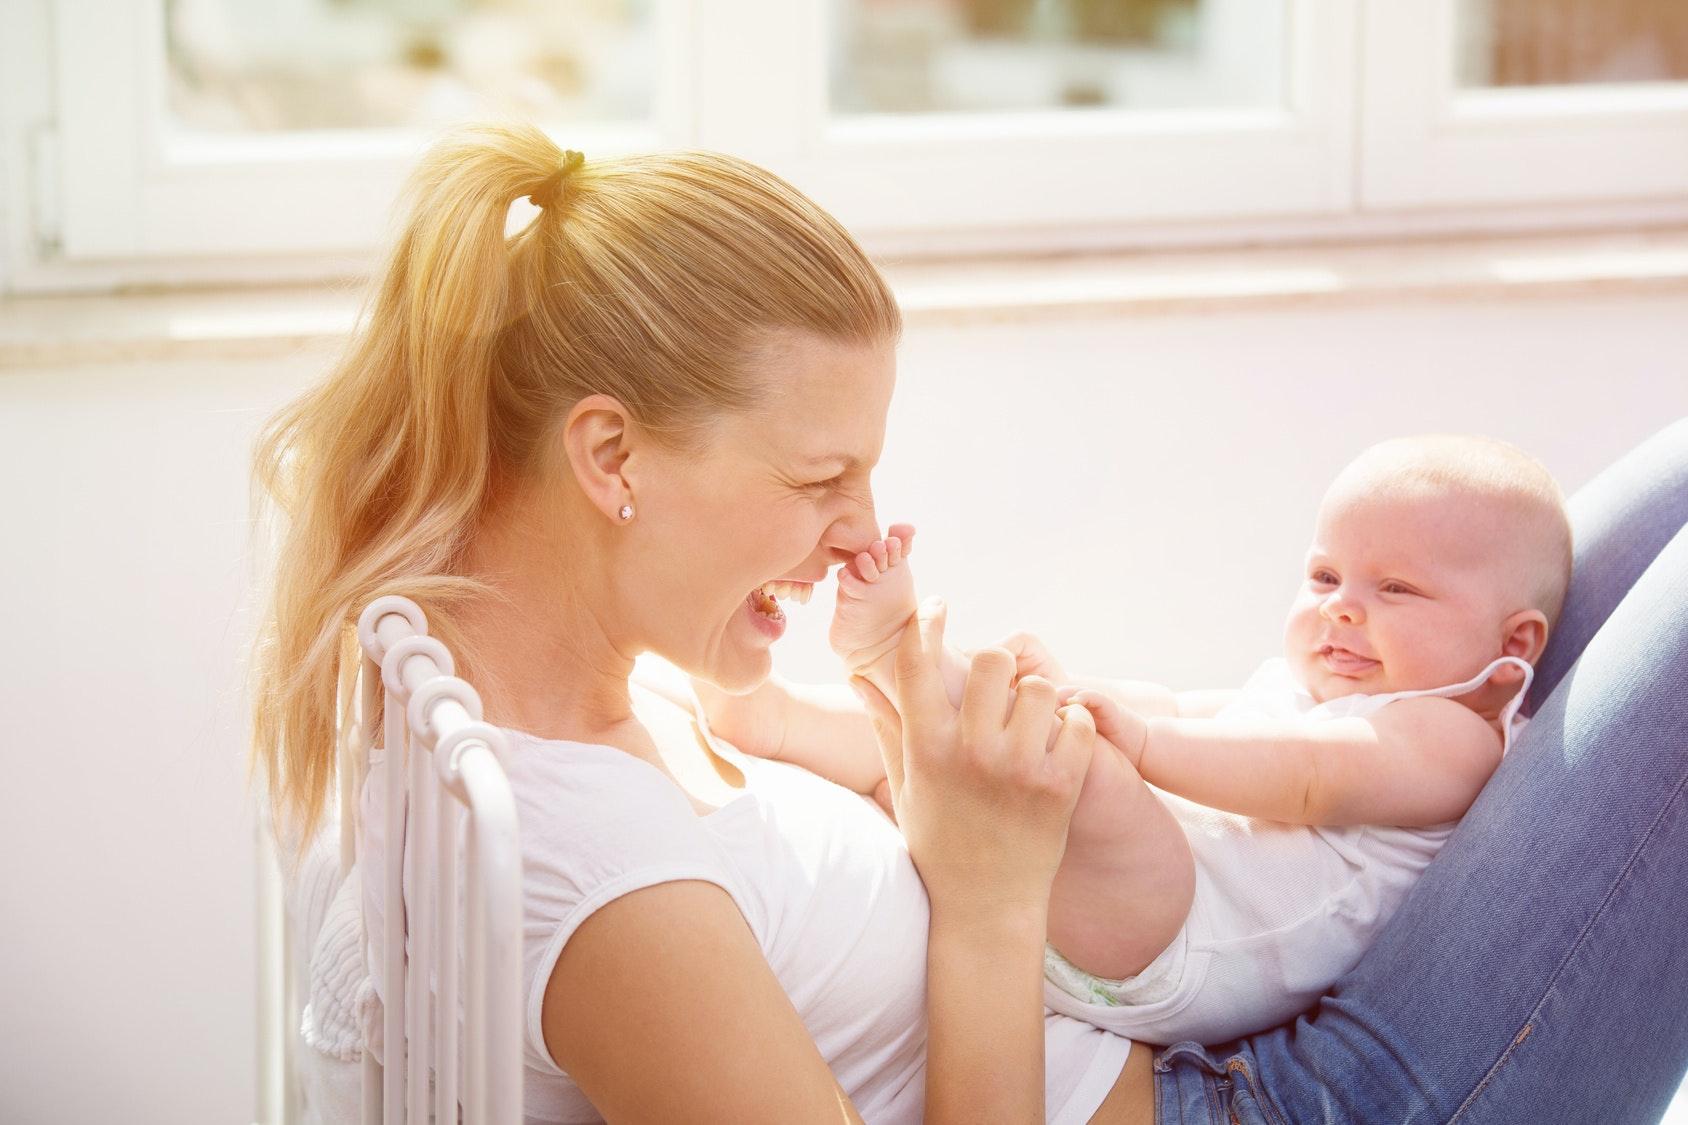 Bébé a 5 mois